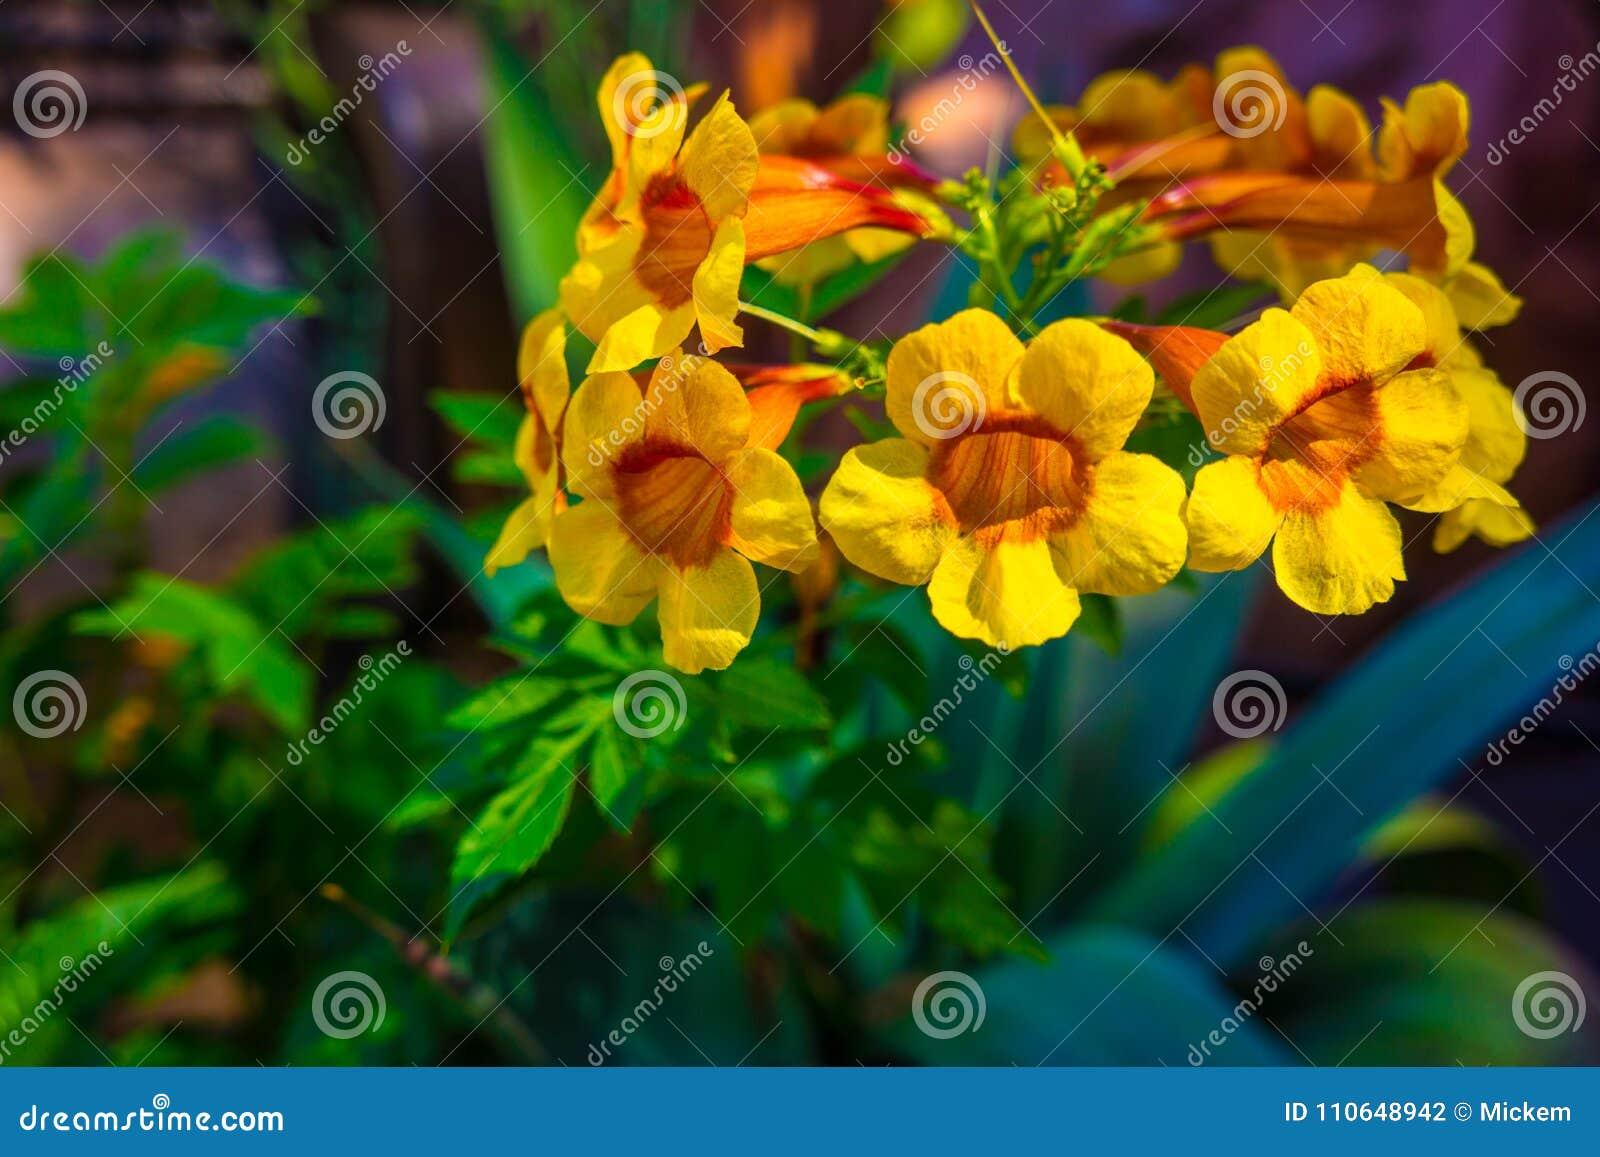 Trumpet bush vine flower closeup stock photo image of bells download trumpet bush vine flower closeup stock photo image of bells blooming 110648942 mightylinksfo